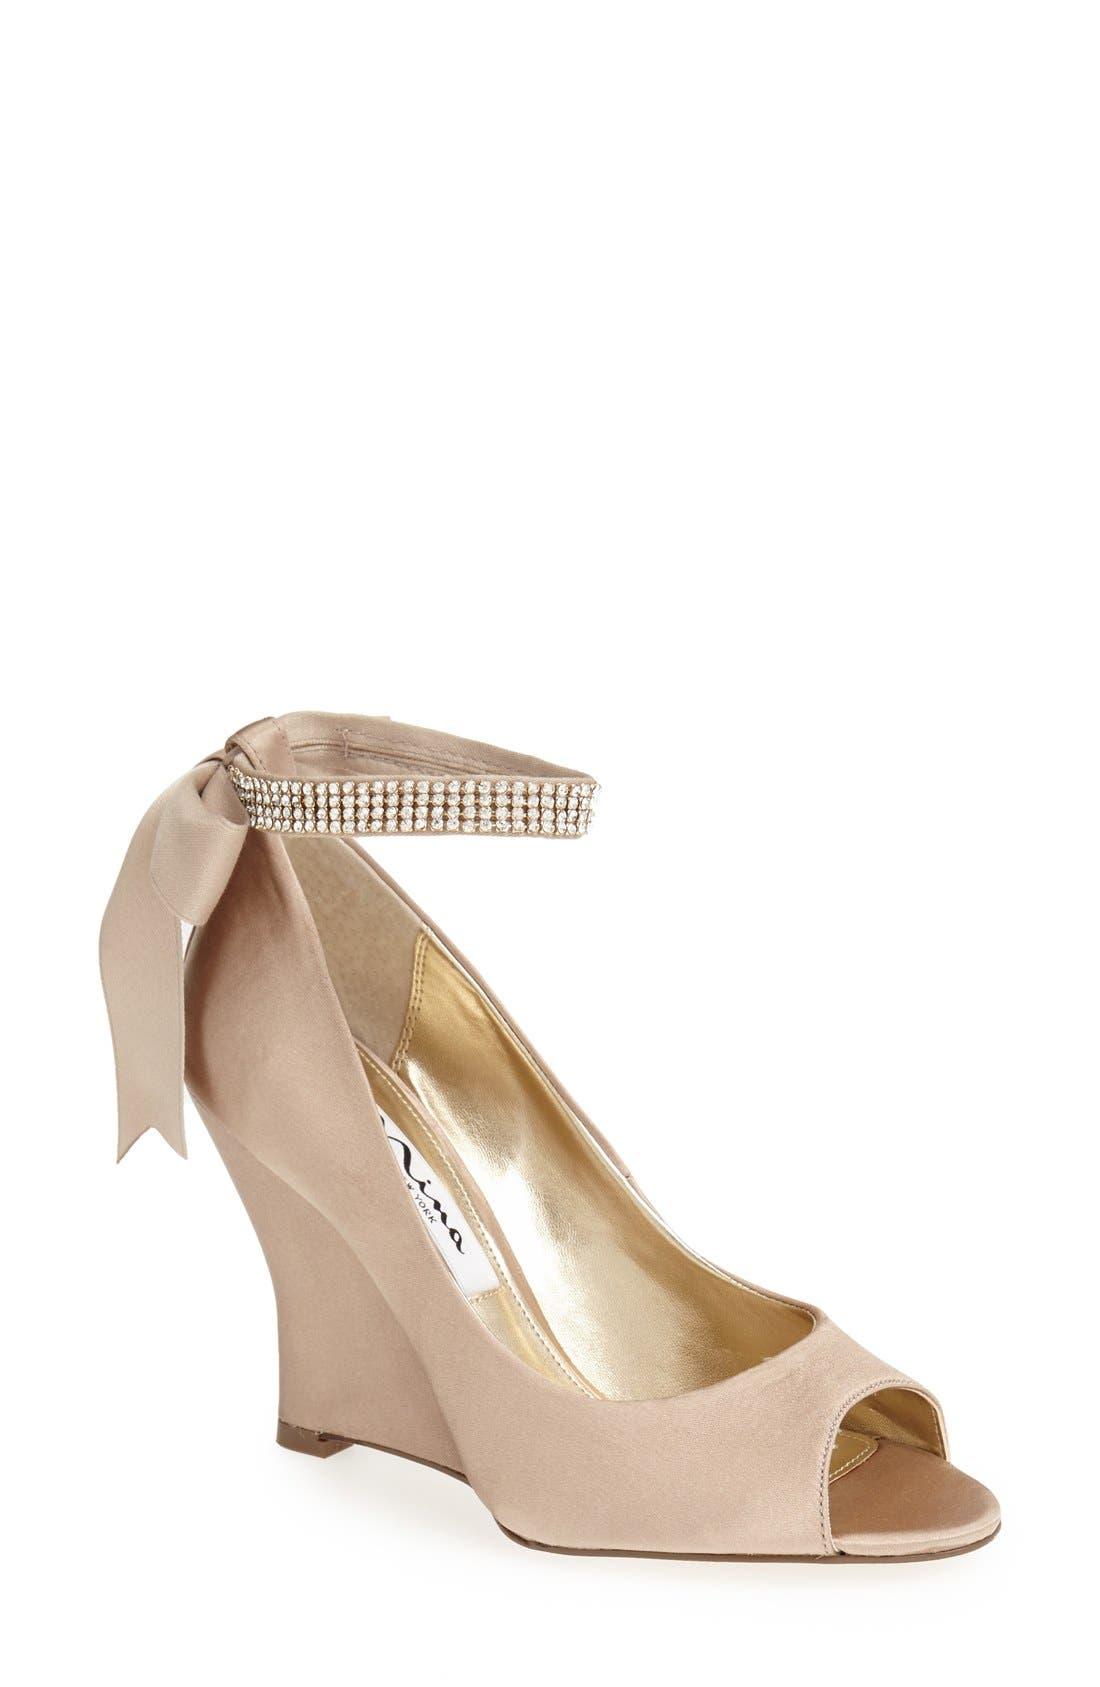 'Emma' Crystal Embellished Ankle Strap Pump,                             Main thumbnail 1, color,                             Champagne Satin